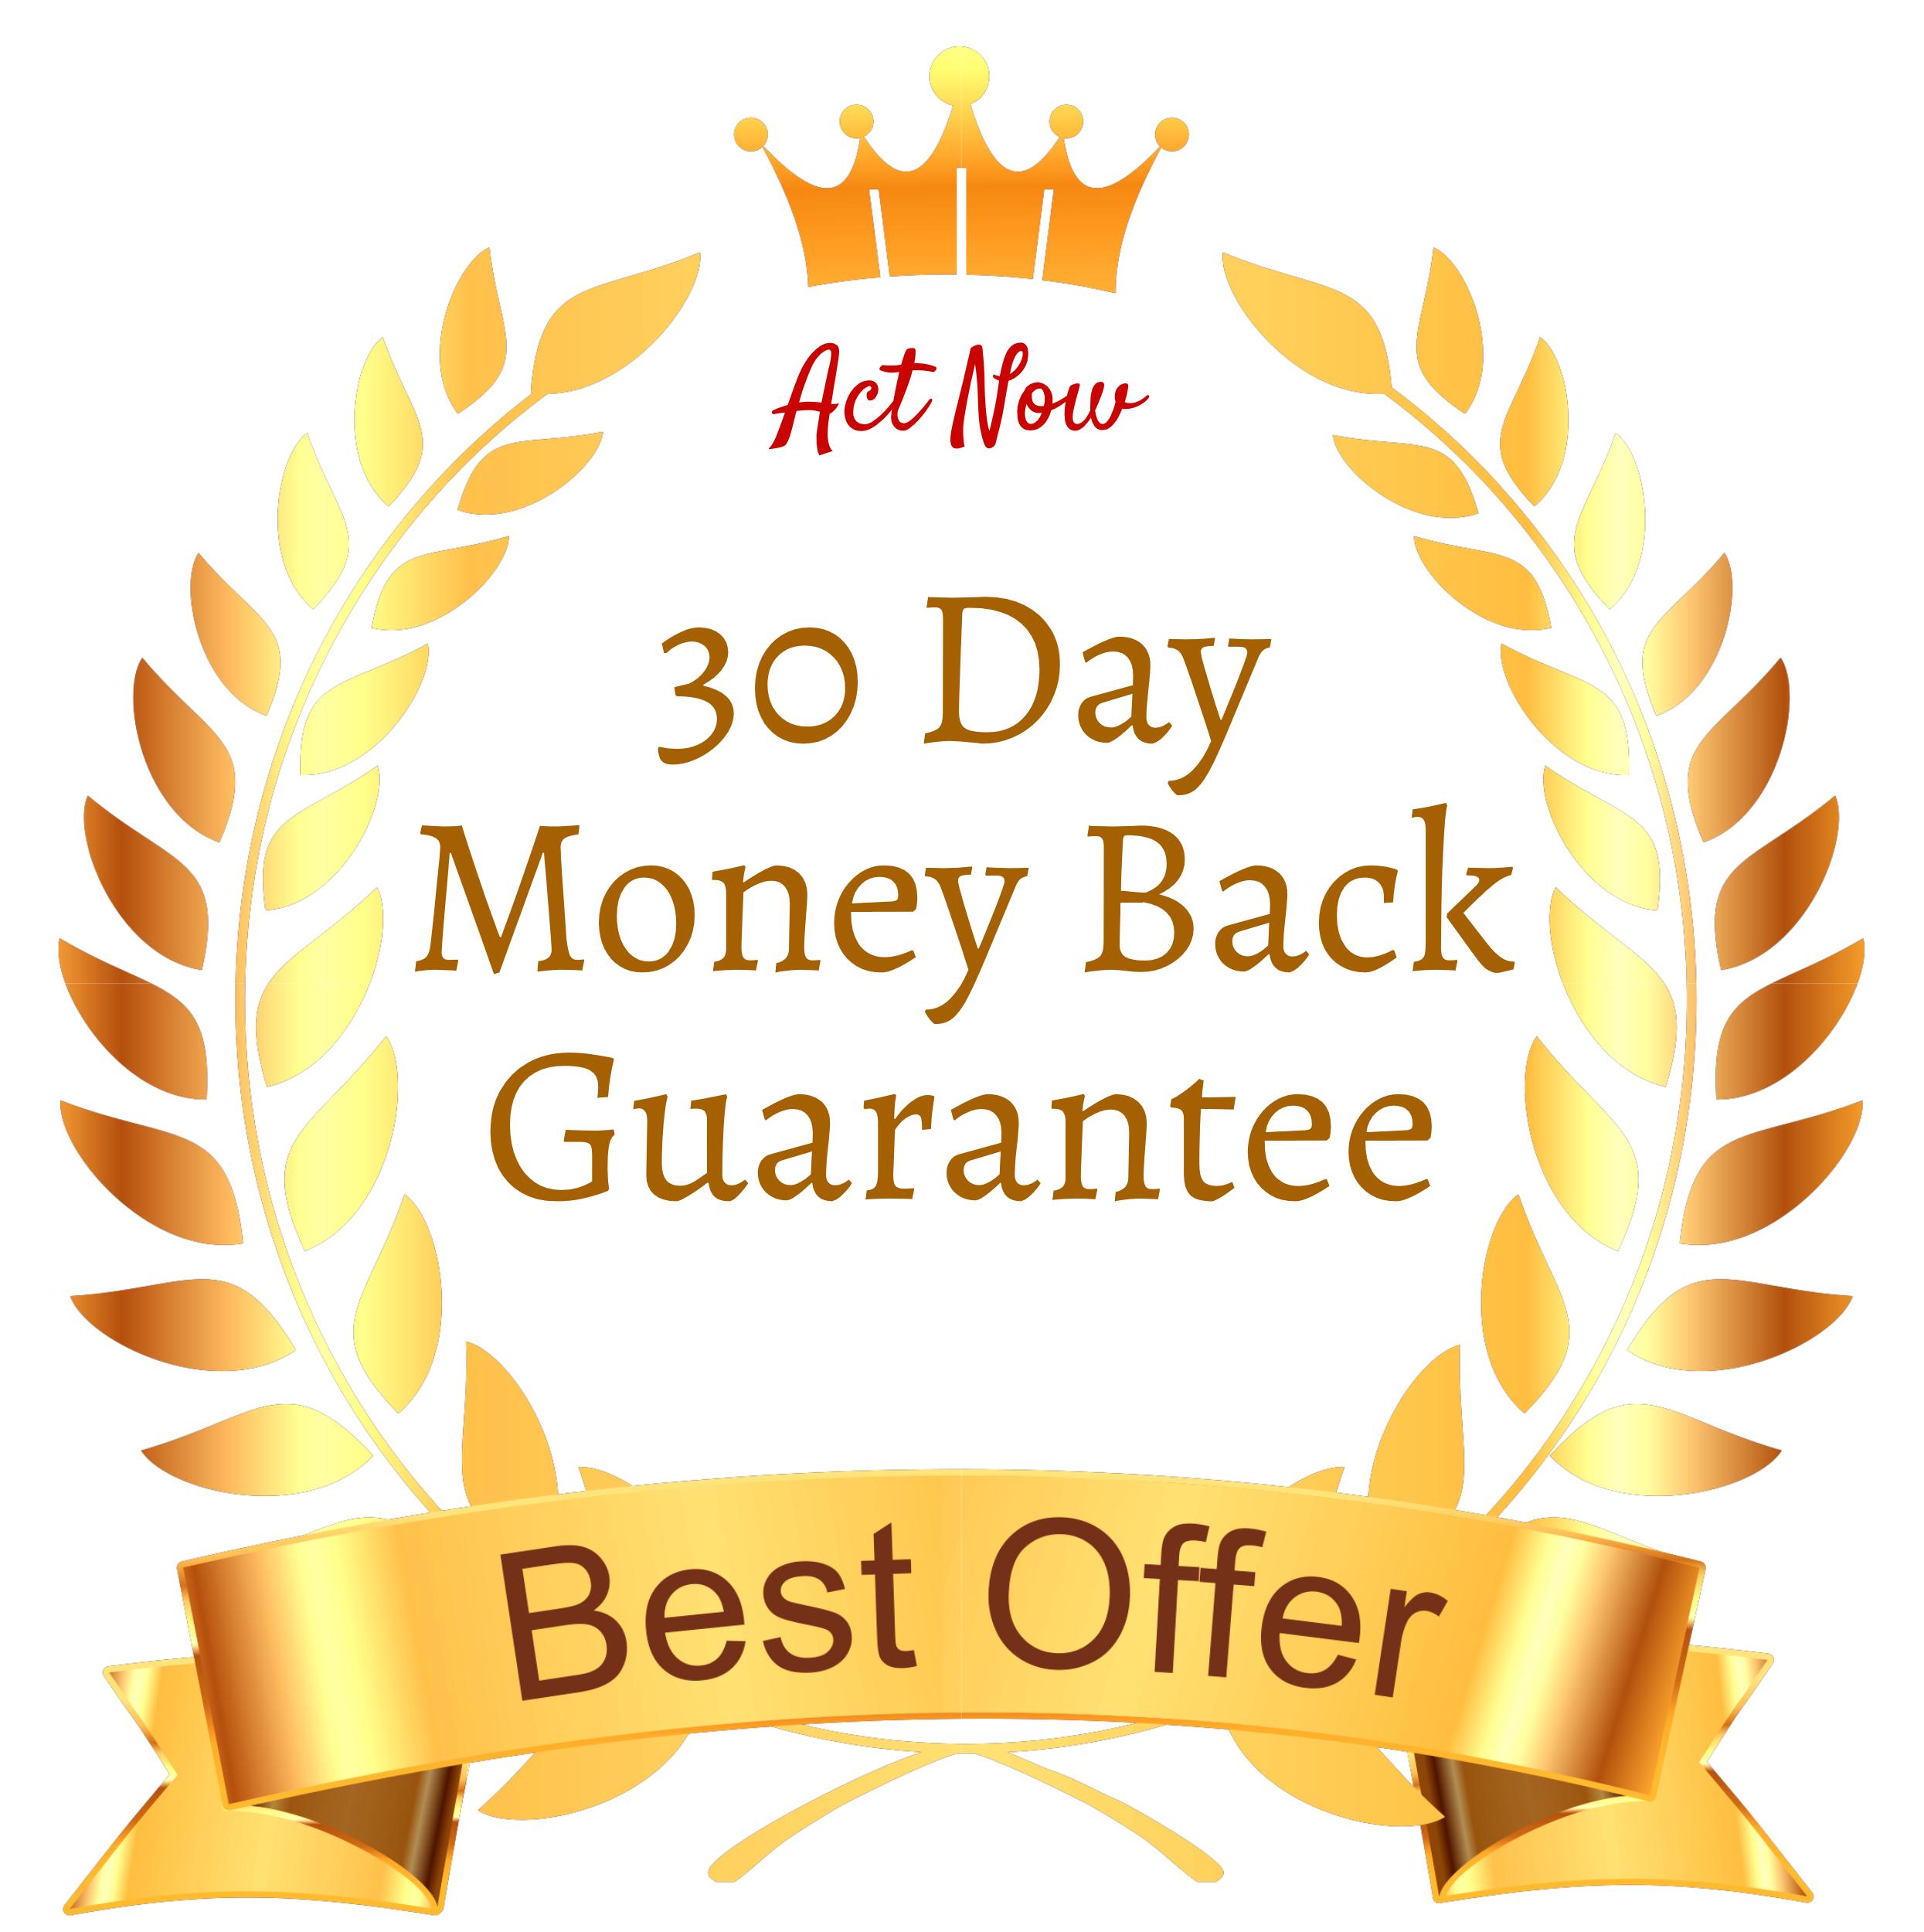 Superhero marketing 30 day money back Guaranteee